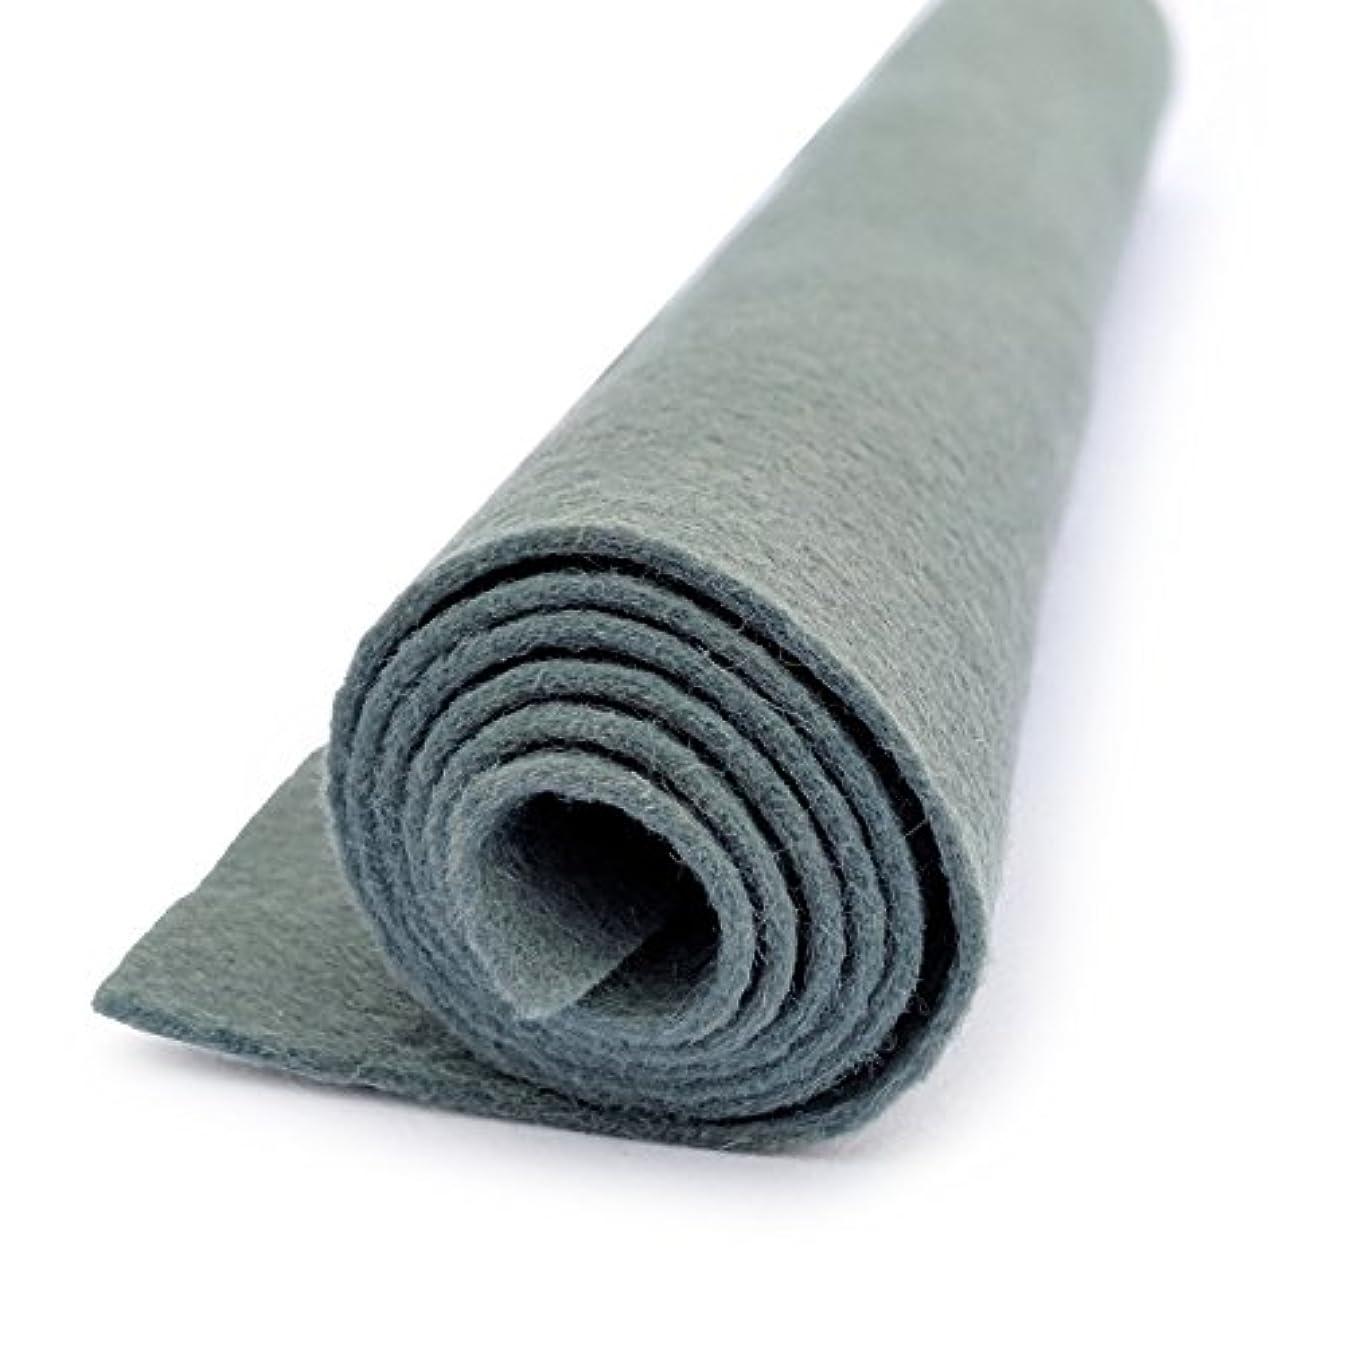 Confederate Blue - Wool Felt Oversized Sheet - 35% Wool Blend - 3 12x18 inch sheets